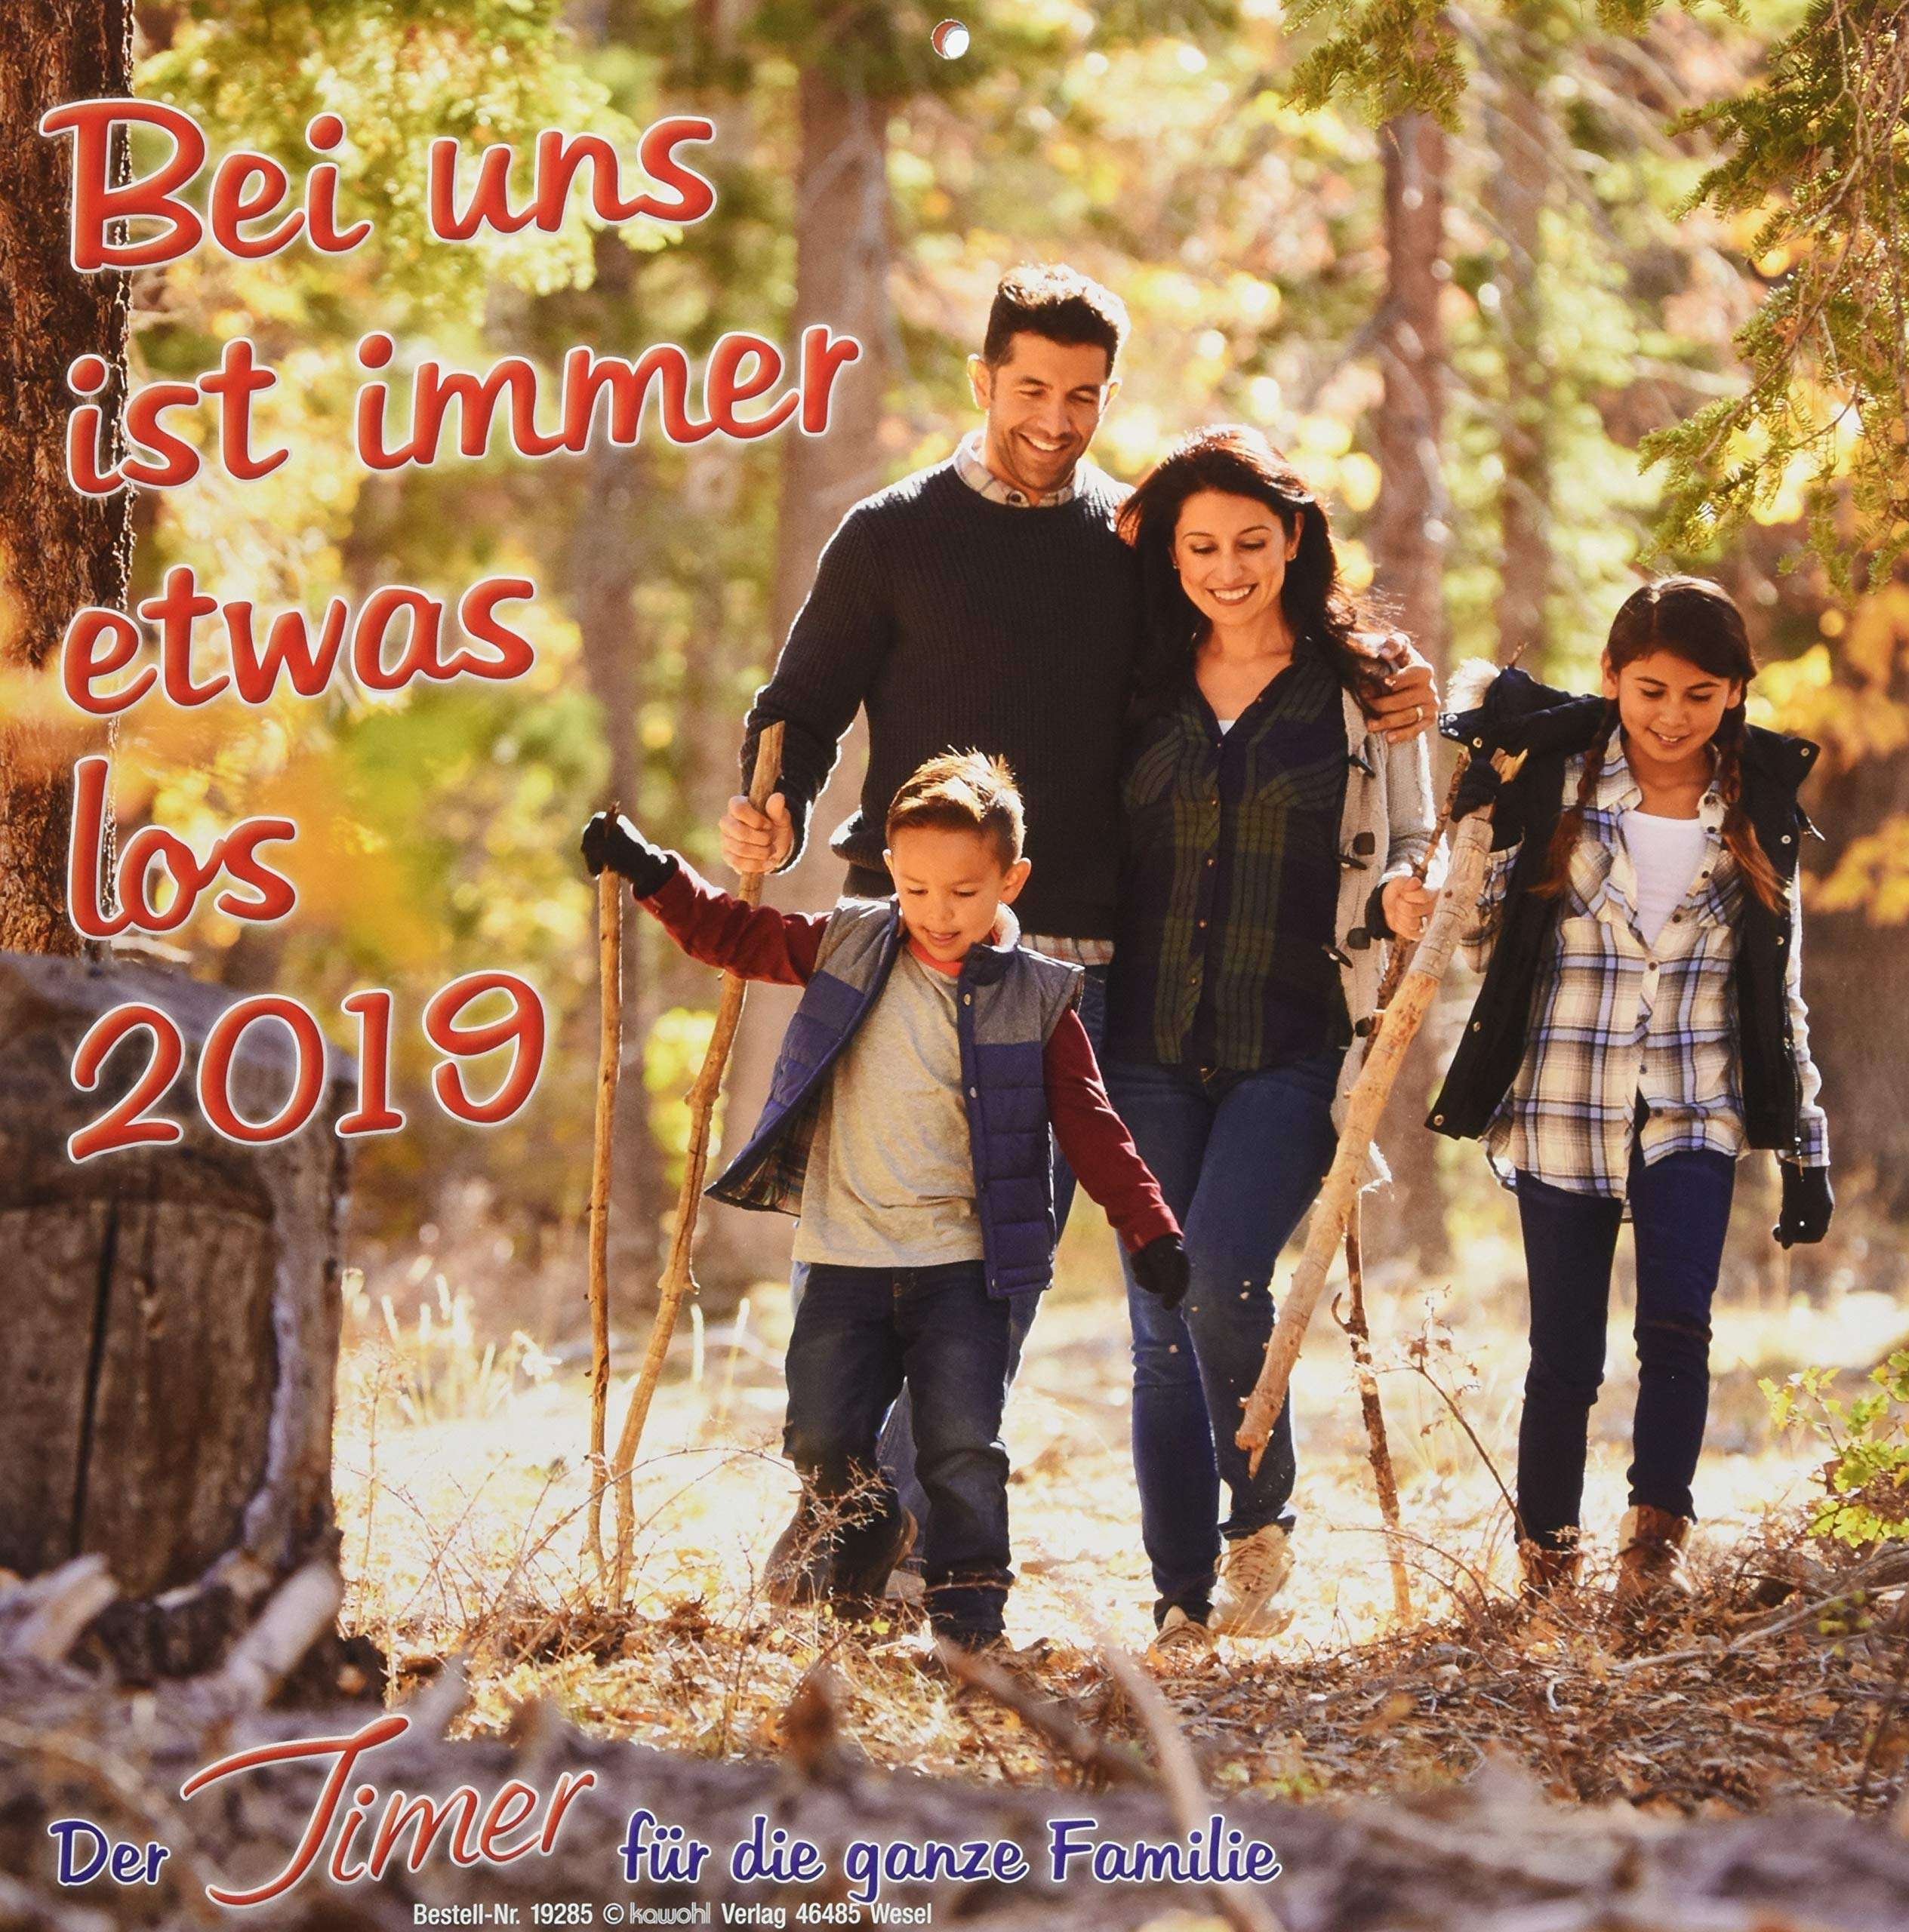 Bei uns ist immer etwas los 2019: Familien-Timer